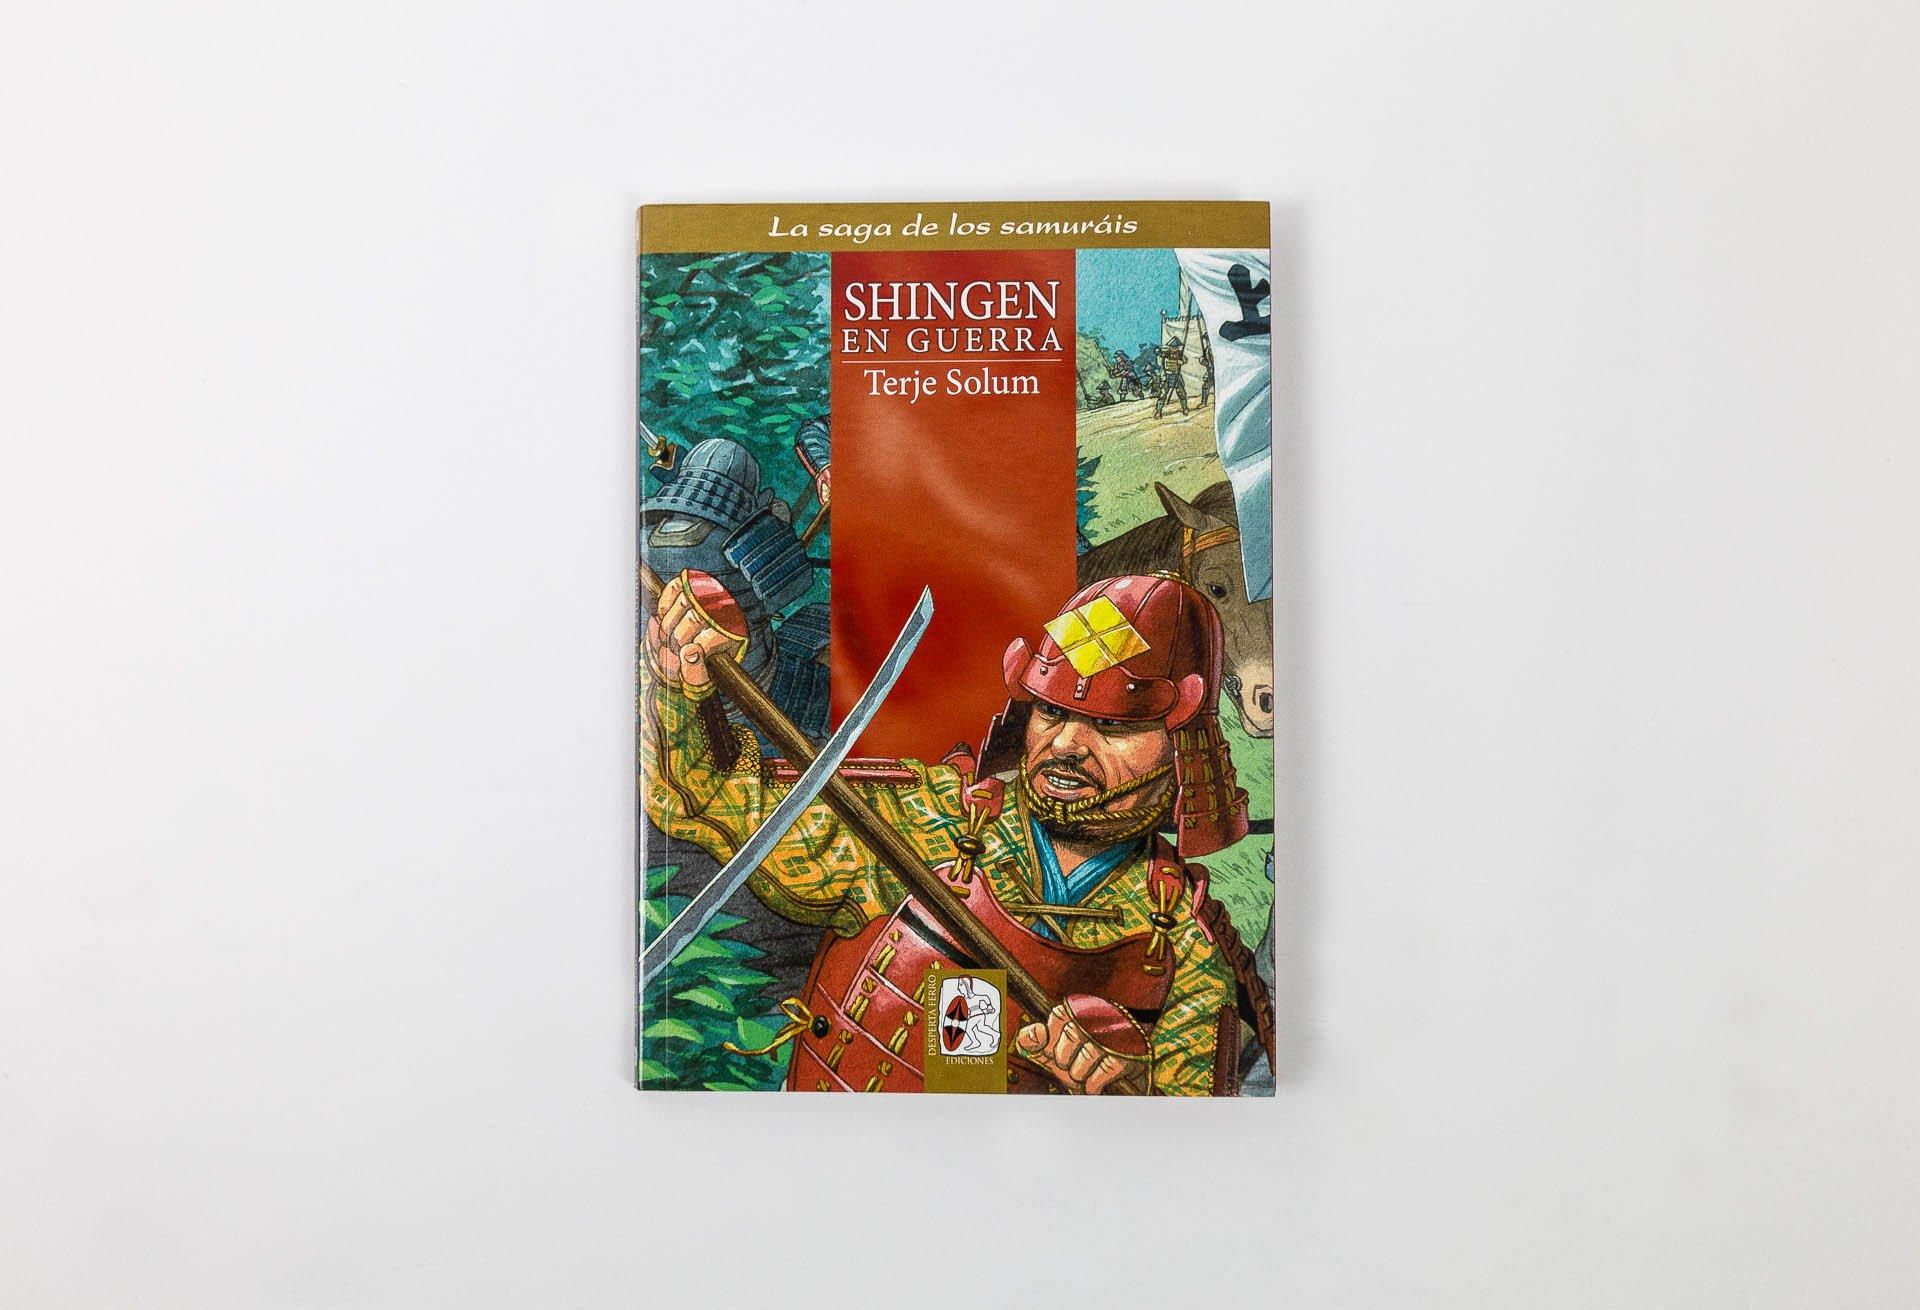 Shingen en guerra: Terje Solum: 9788494392283: Amazon.com: Books